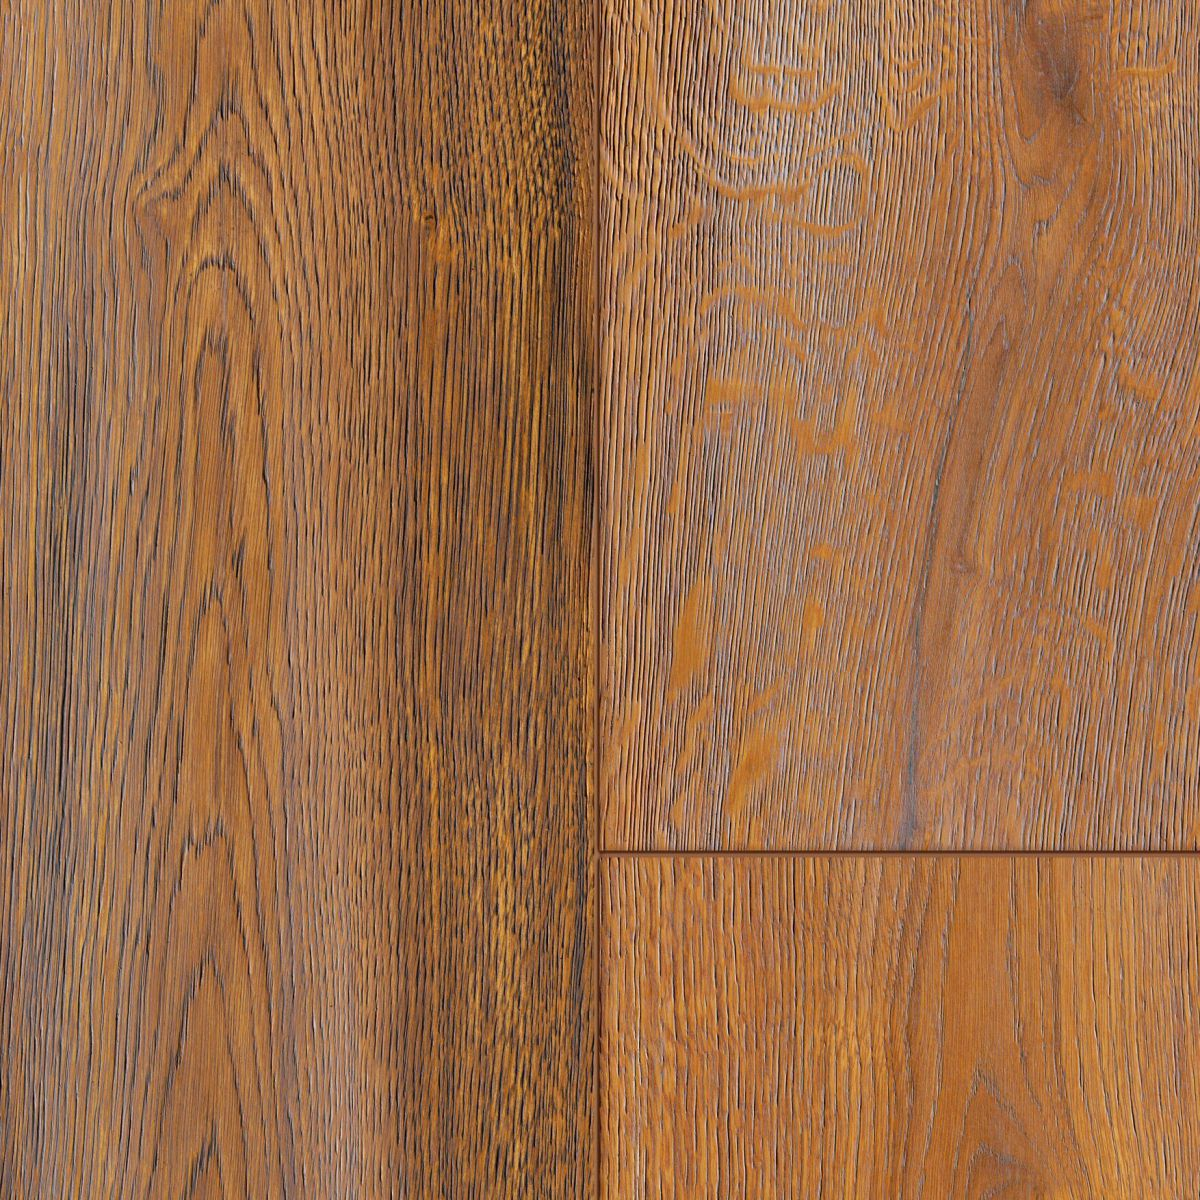 Avatara vloerdelen hout N07 detail